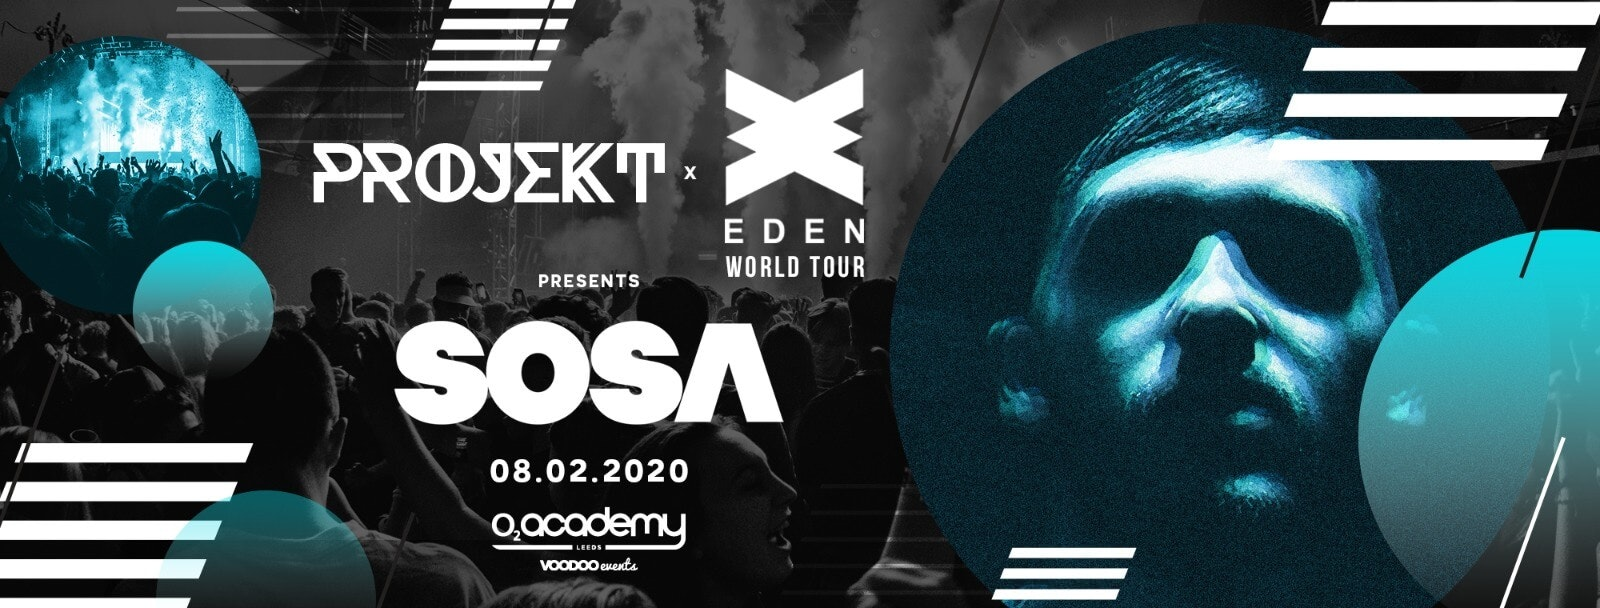 PROJEKT x Eden Ibiza World Tour present SOSA